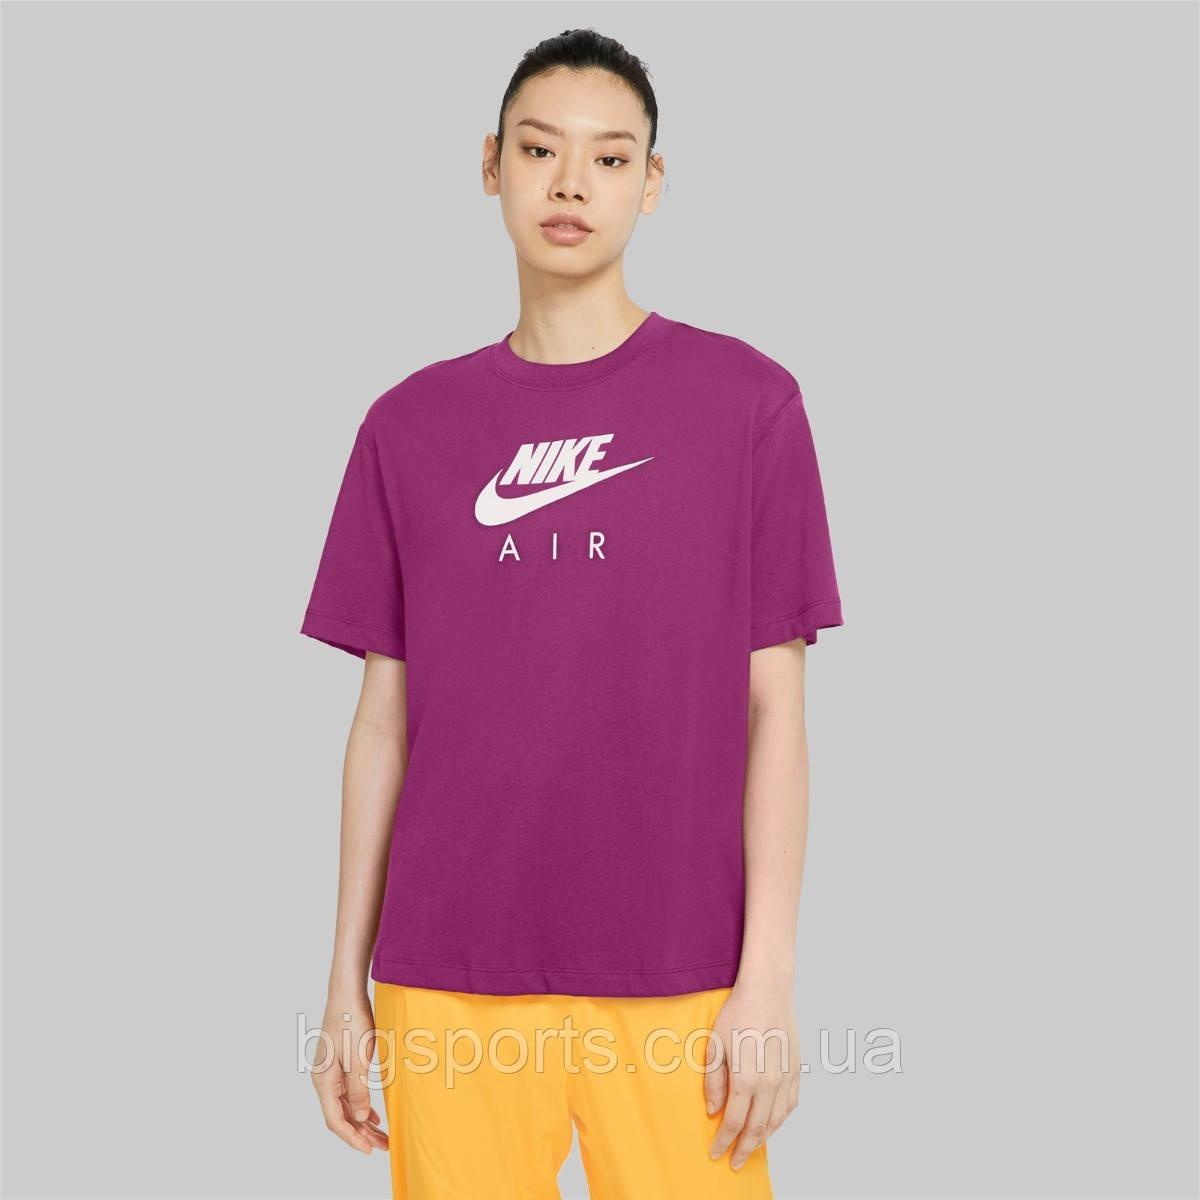 Футболка жен. Nike Air Women's Short Sleeve Top (арт. CU5558-564)